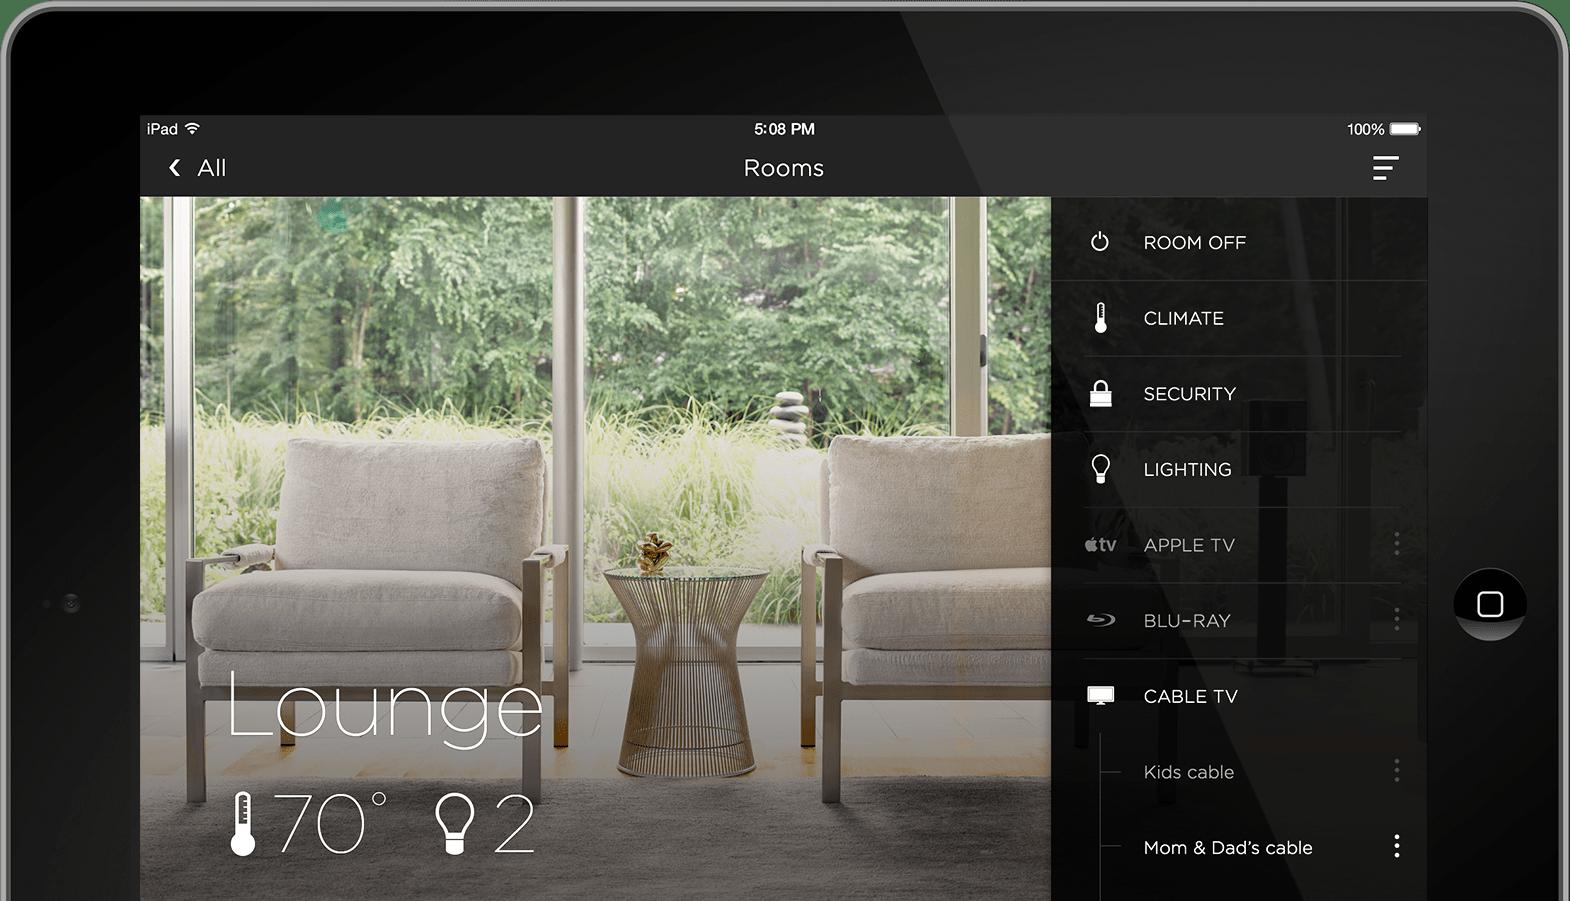 iPad Smart Home